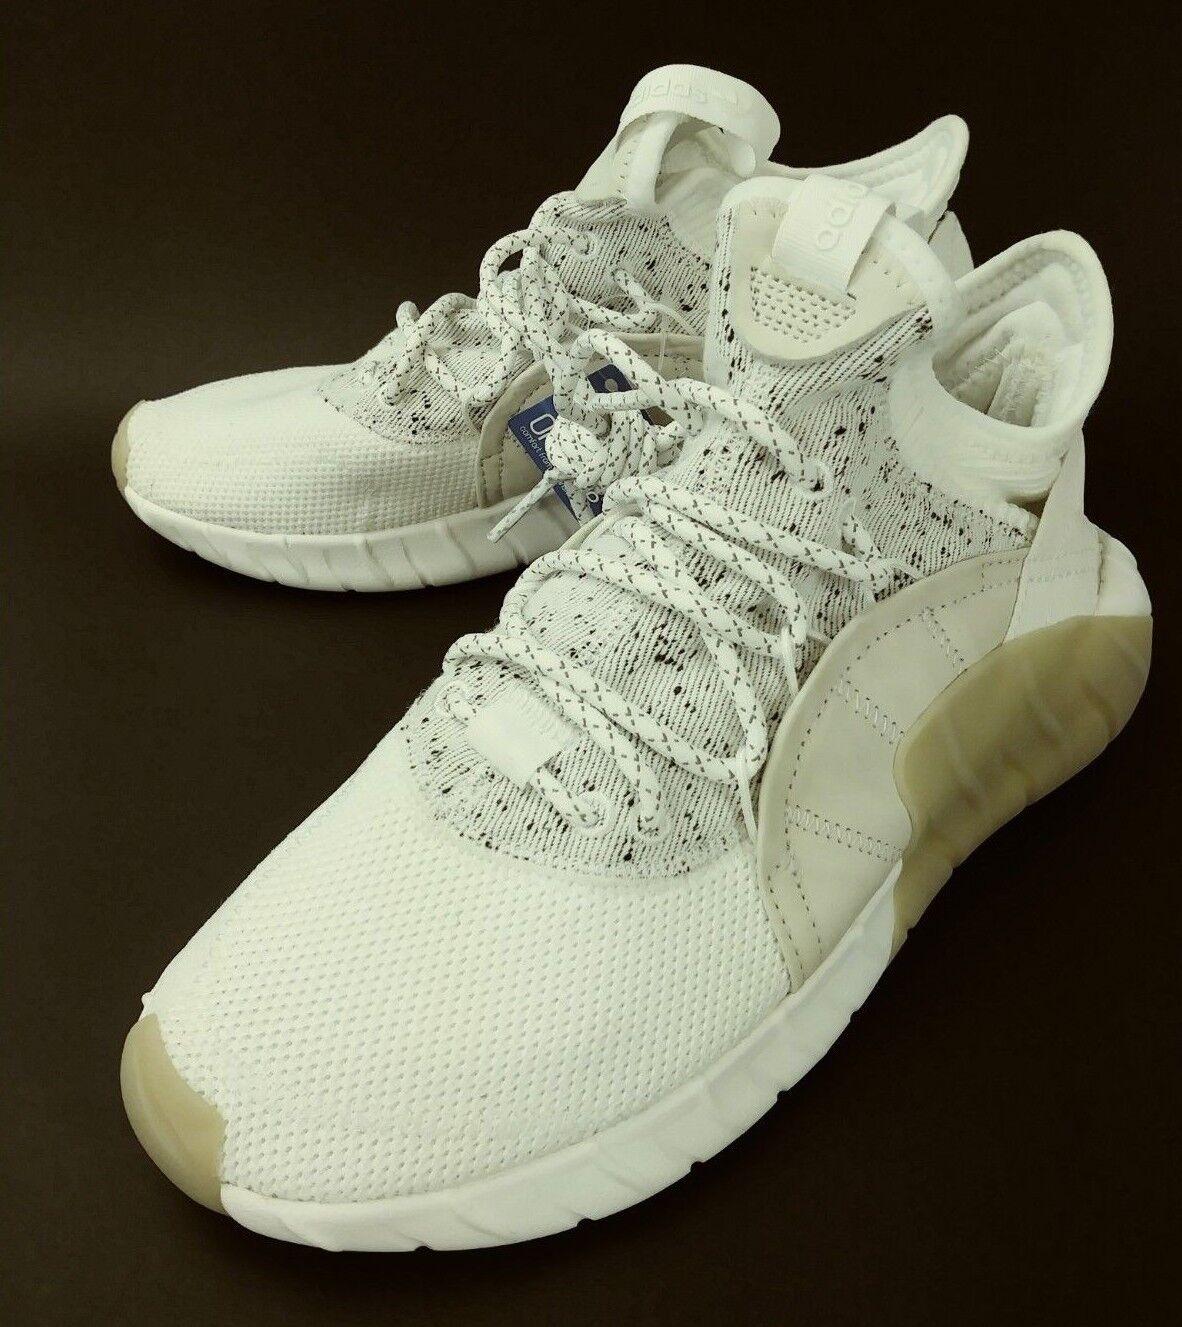 Adidas Mens shoes Sneakers US 6.5 White Athletic tubular rise primeknit New 2873